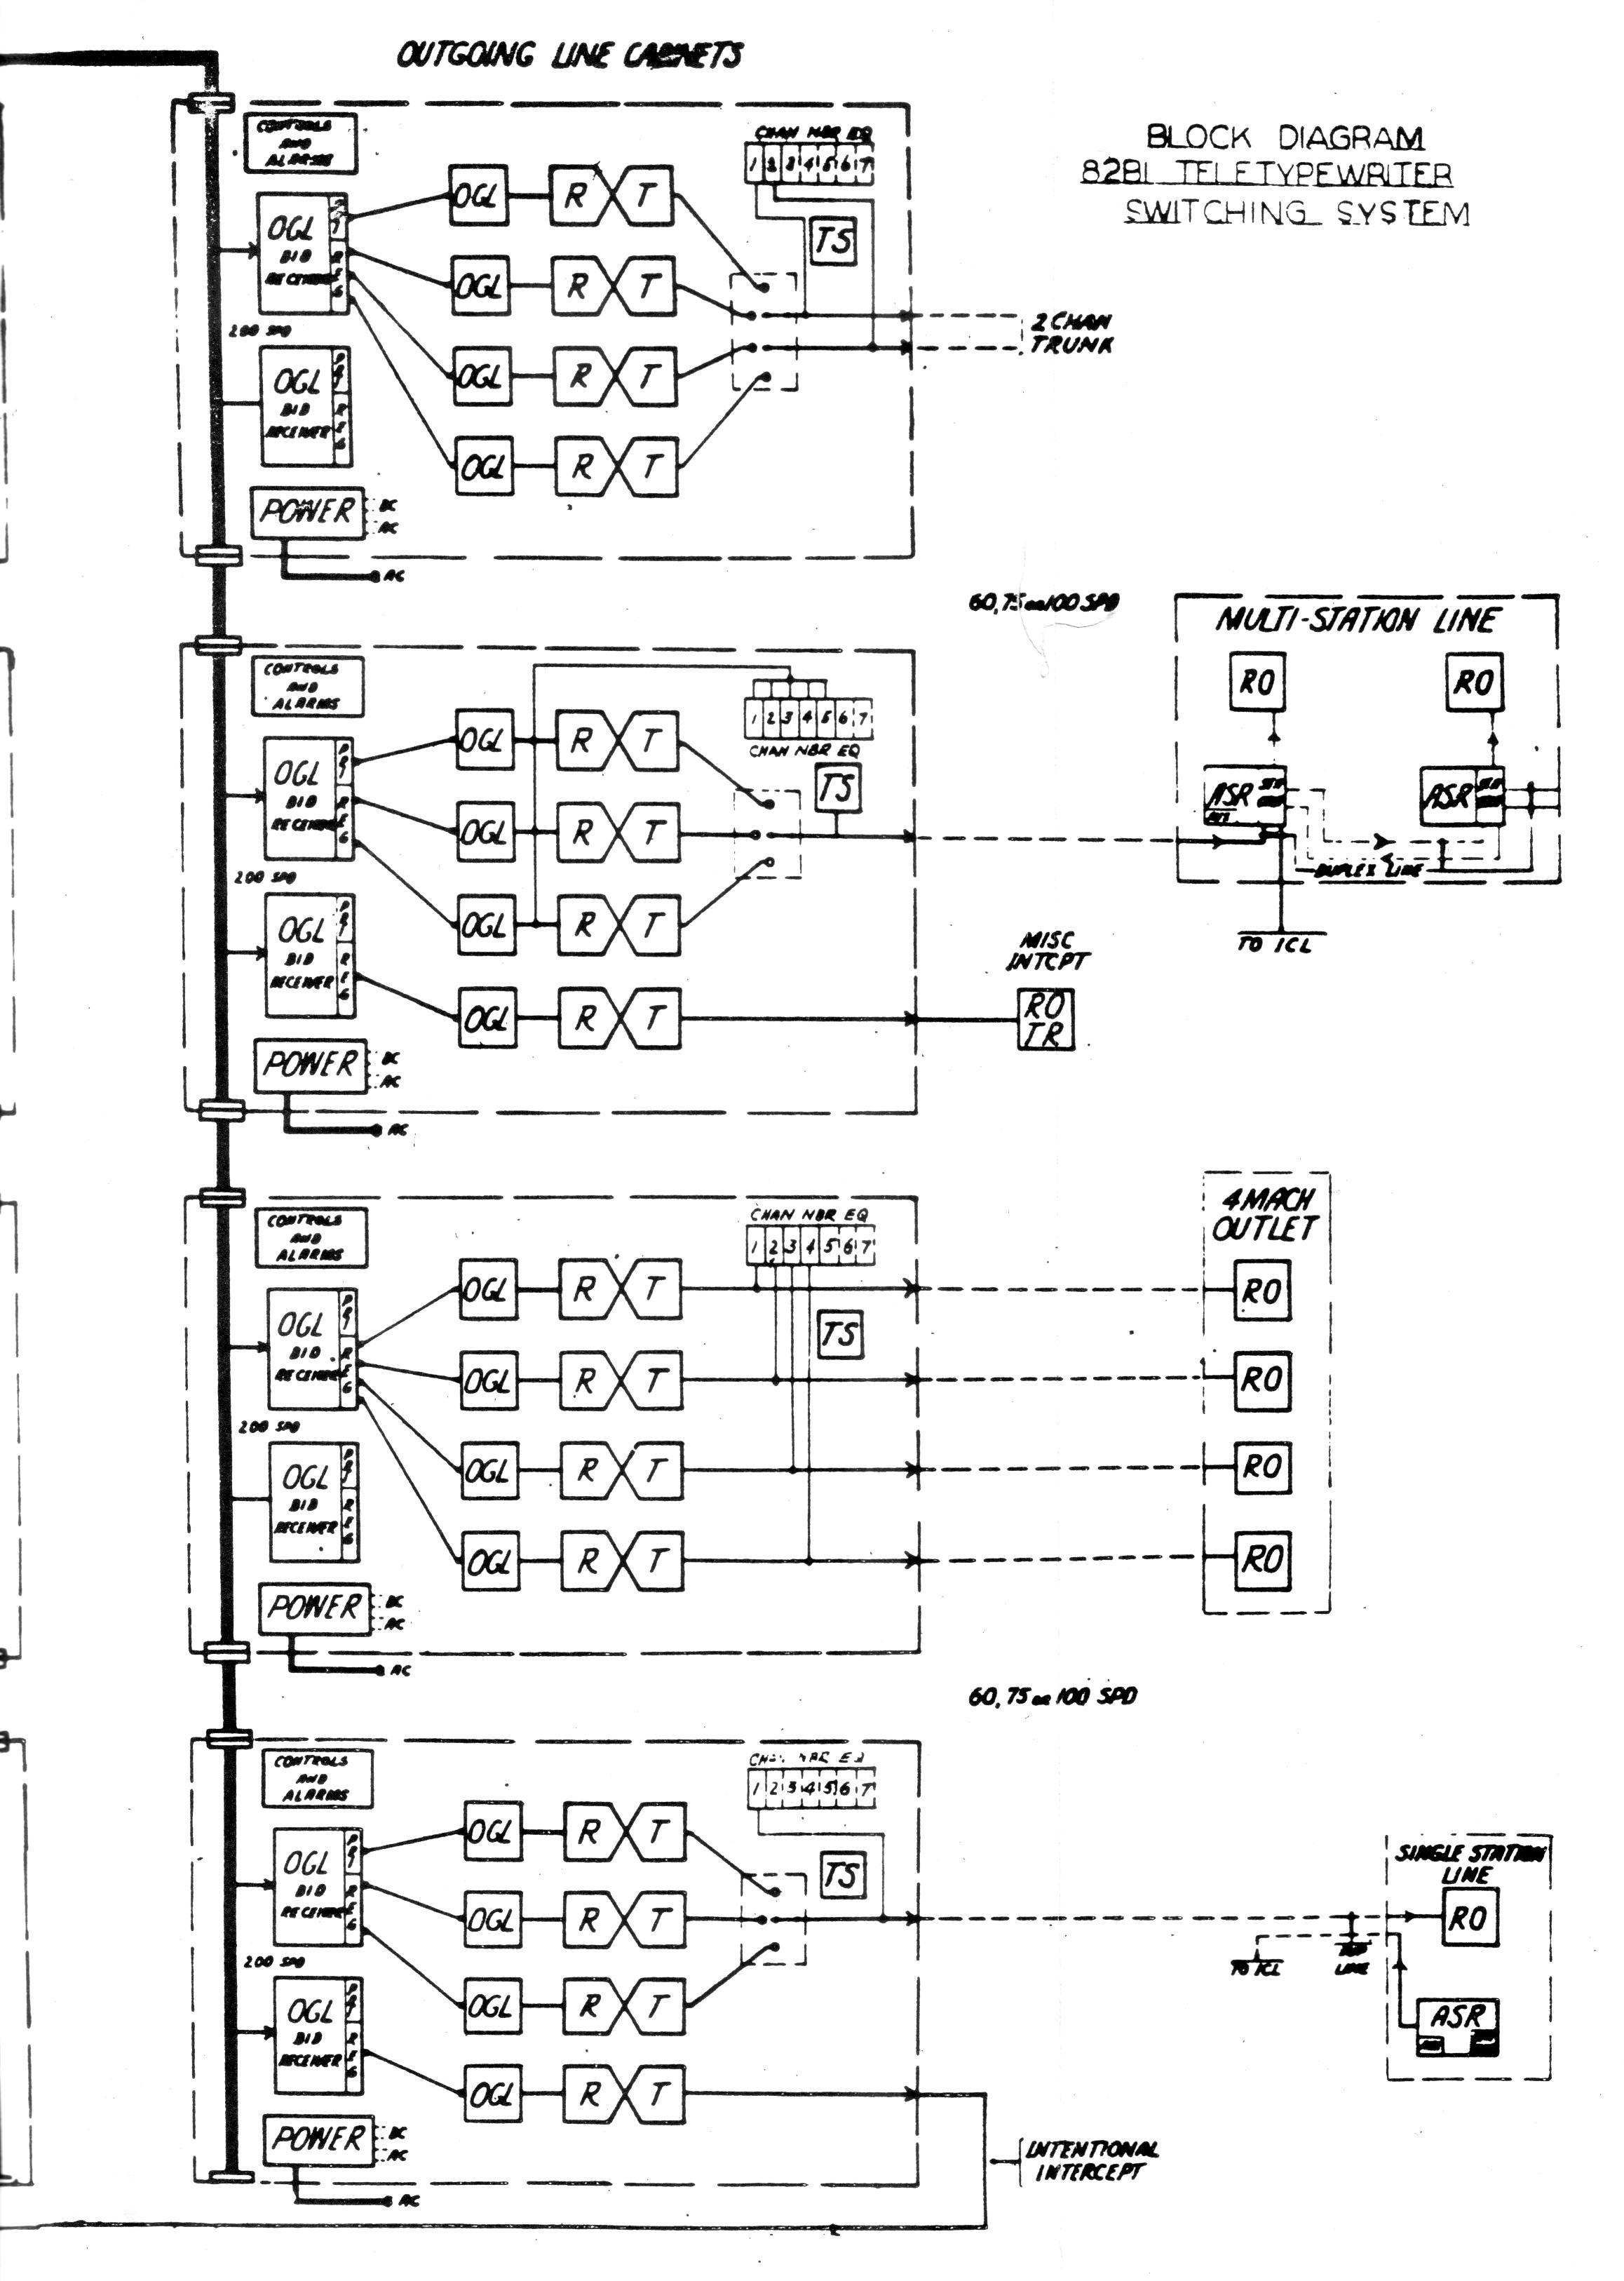 trenton wiring diagrams wiring diagrams schematics rh wearabletec co Basic Electrical Wiring Diagrams Light Switch Wiring Diagram